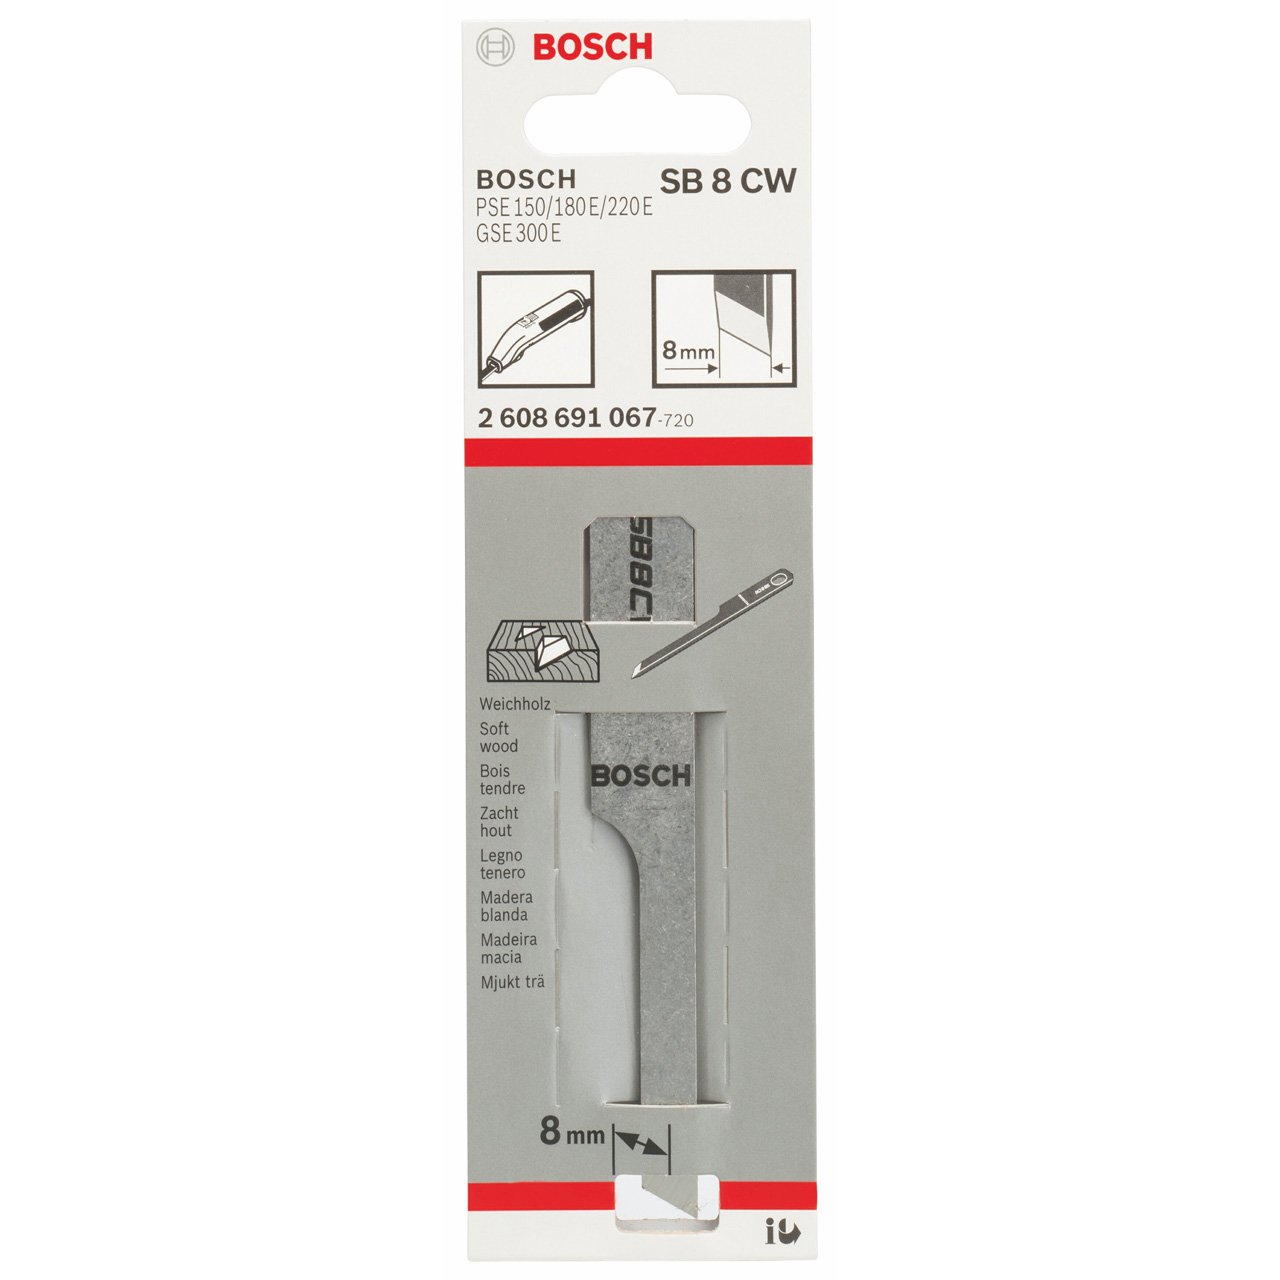 Bosch Stechbeitel SB 8 CW